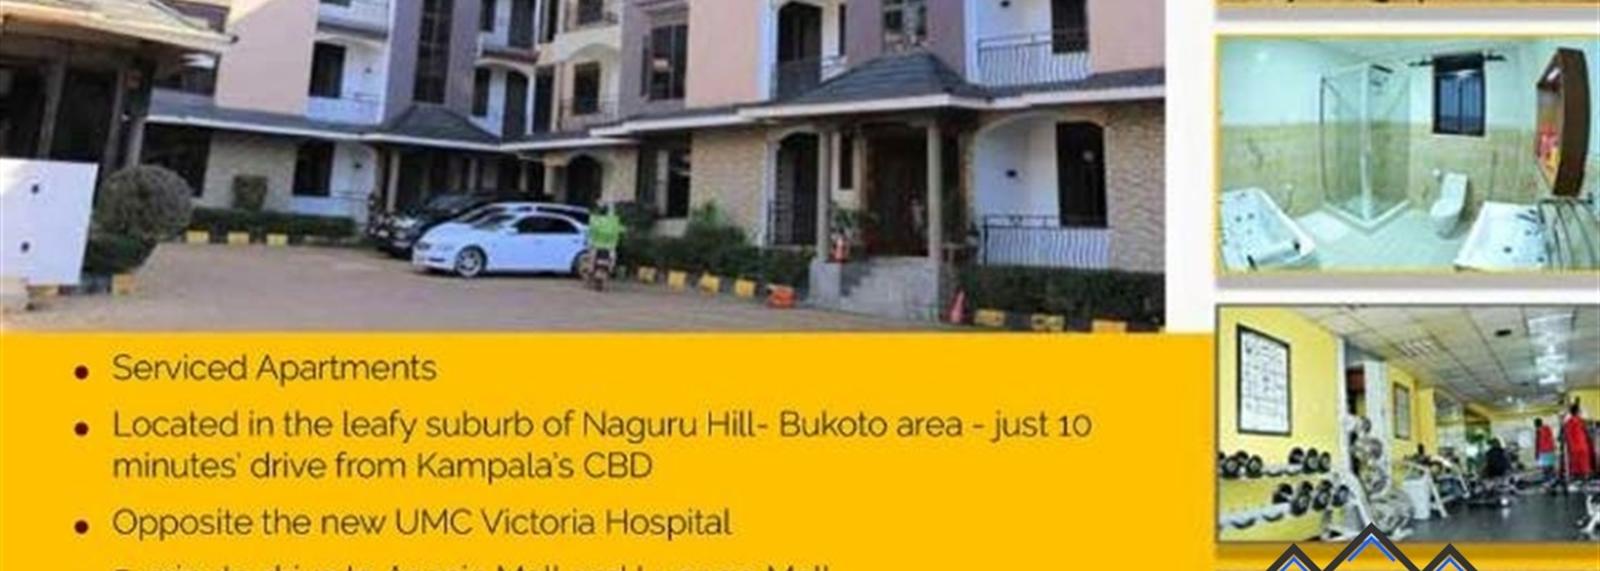 Bukoto